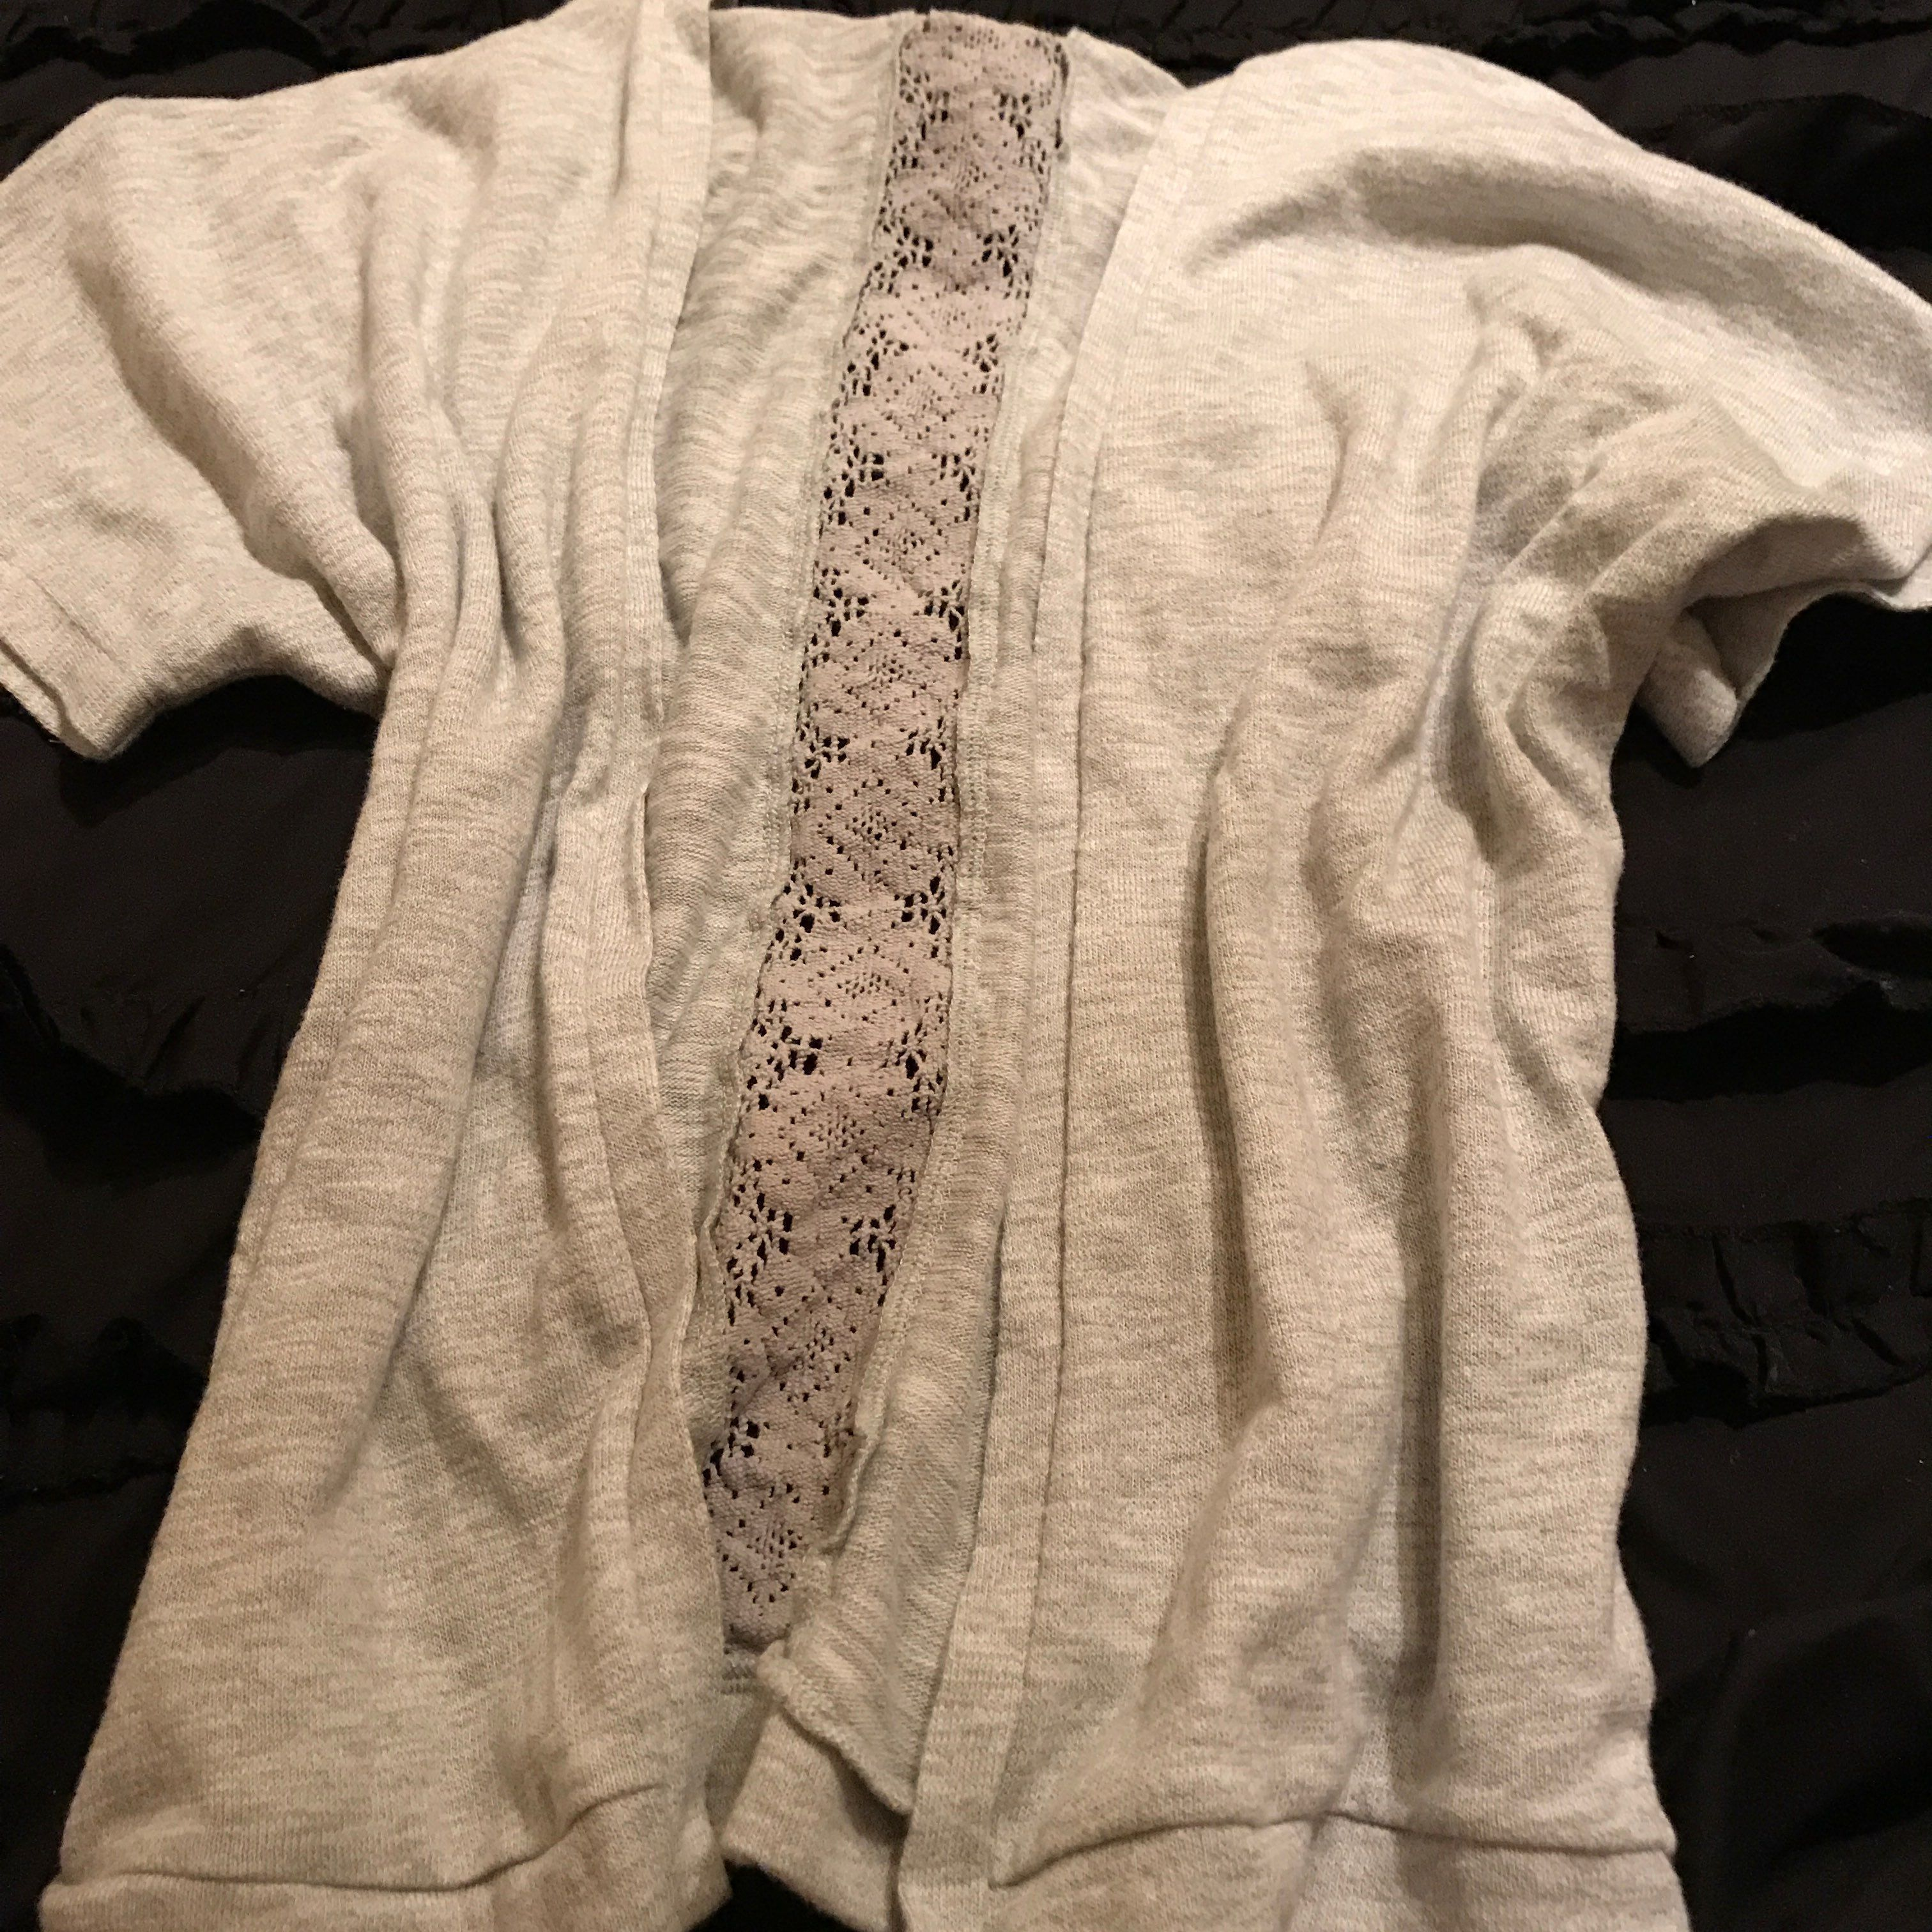 Short Sleeve Cardigan - Mercari: BUY & SELL THINGS YOU LOVE